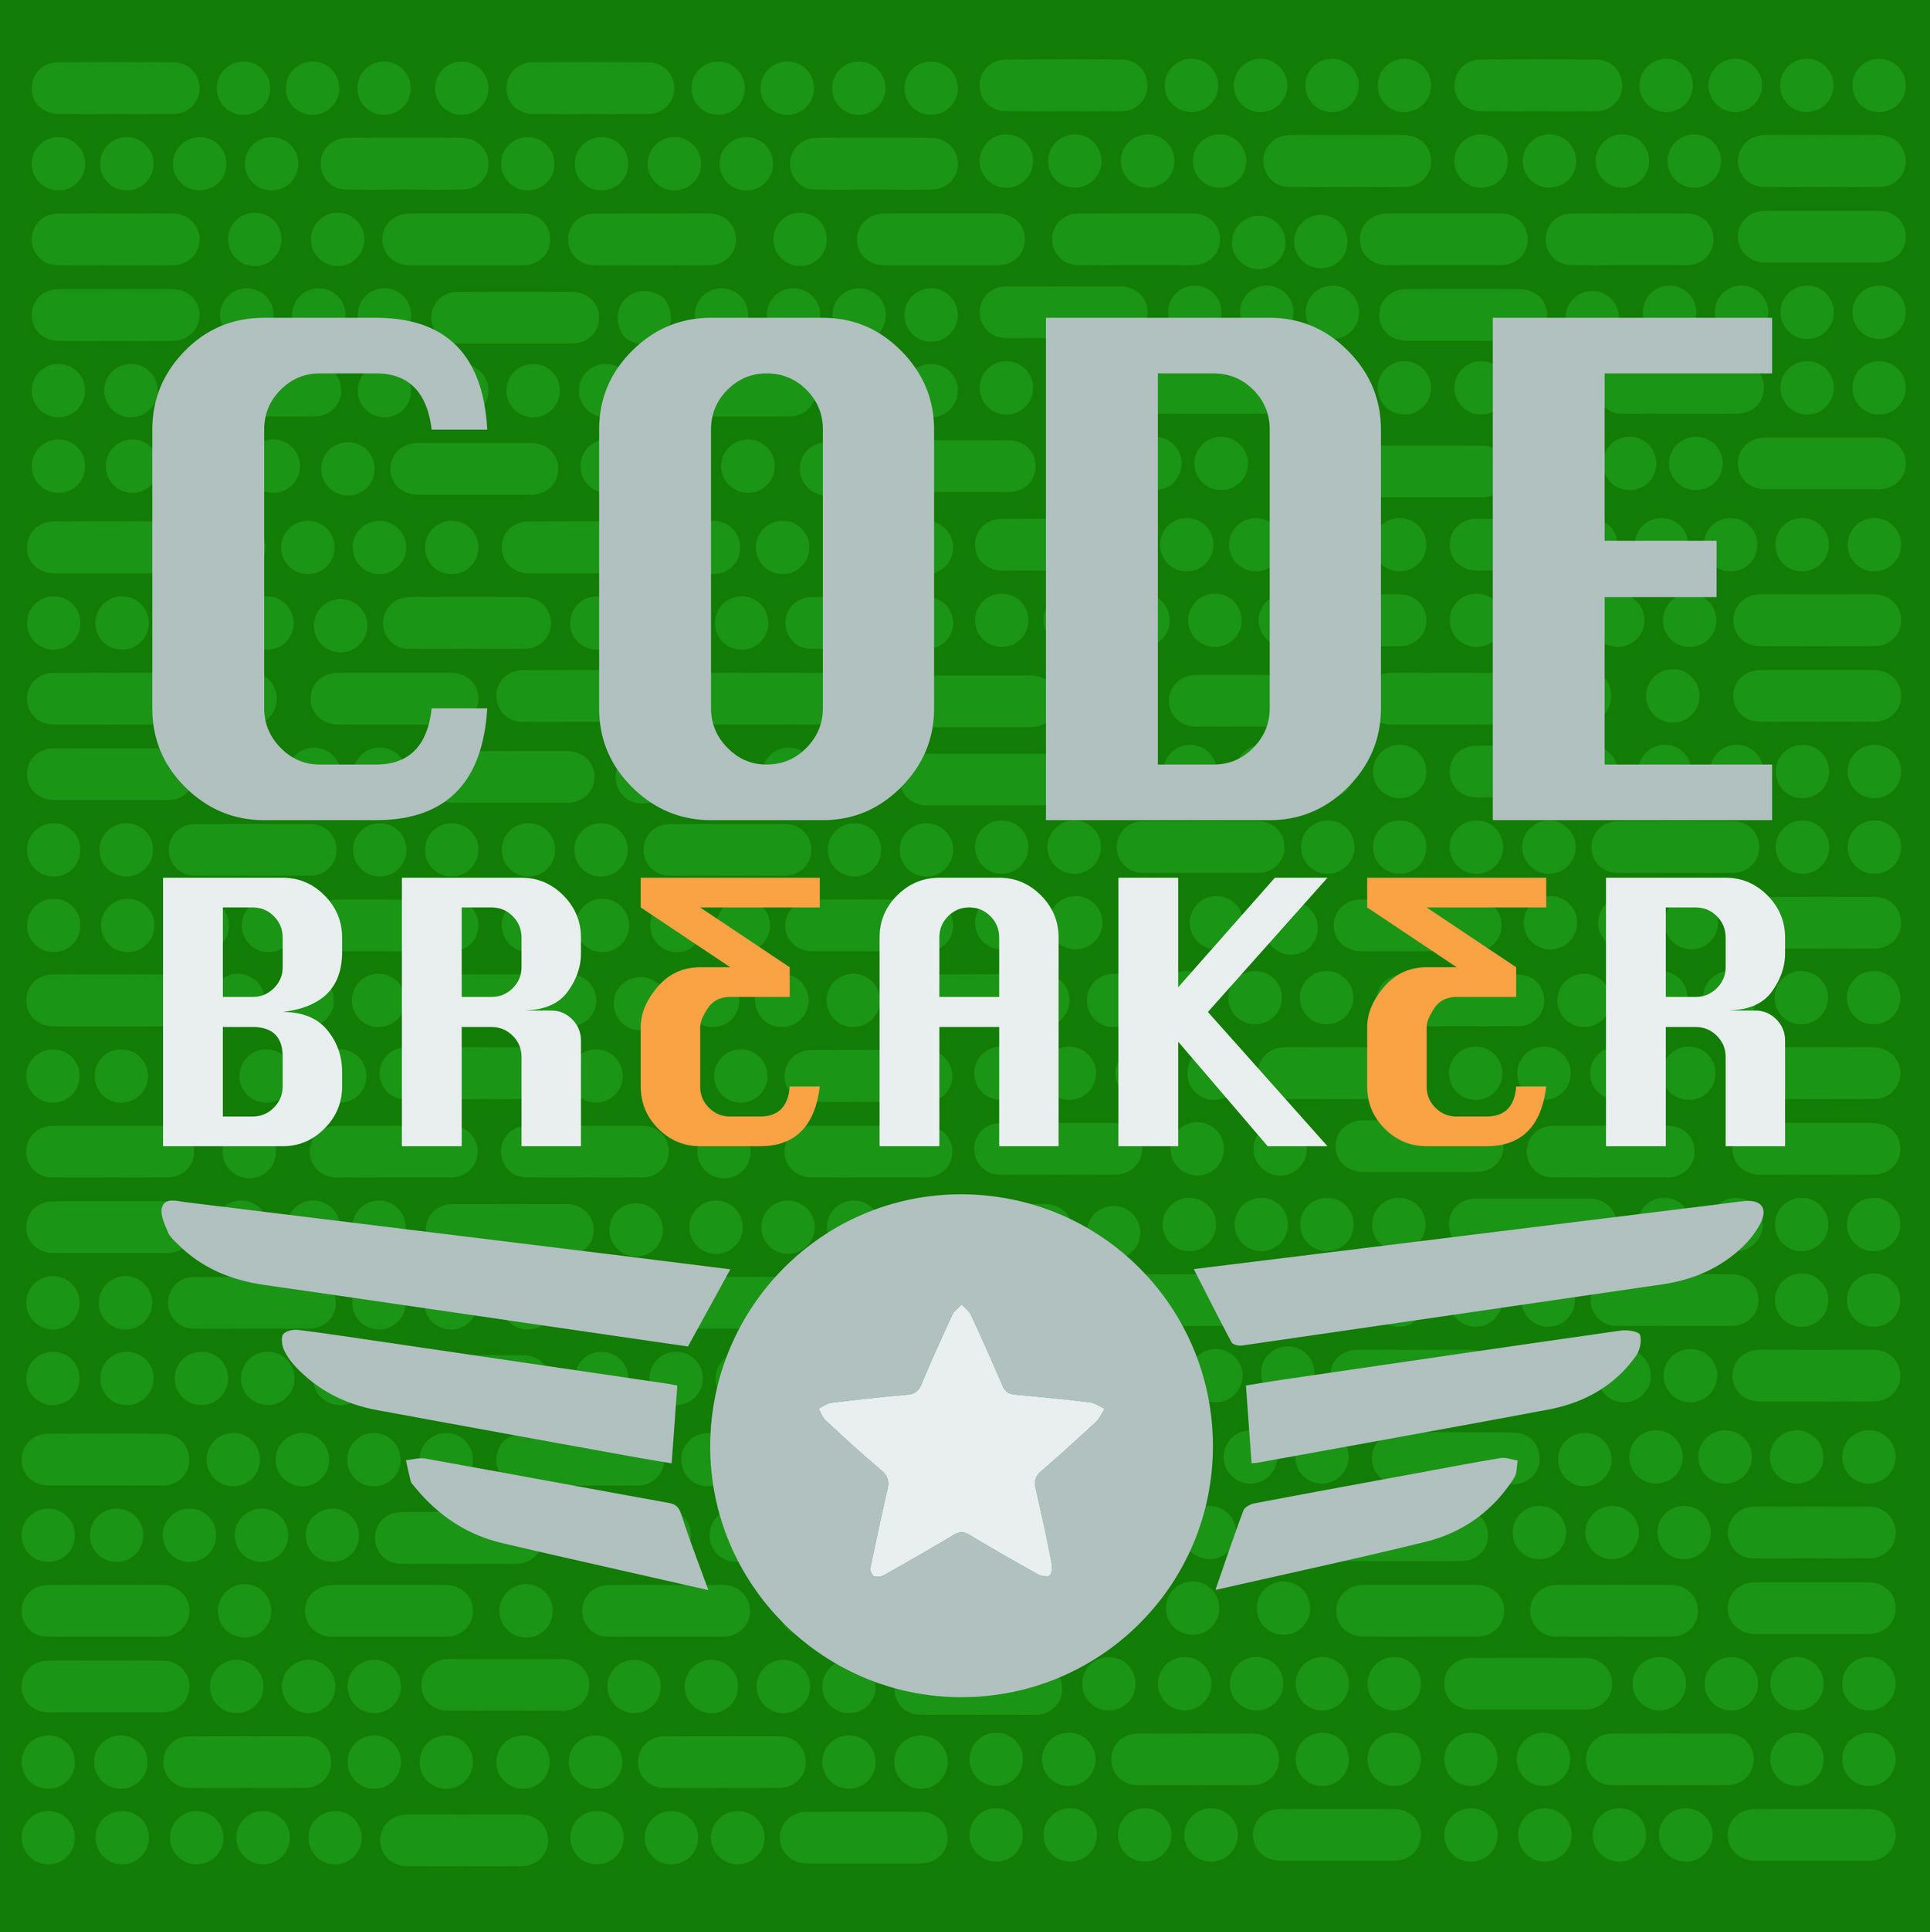 CodeBreakerLogo.jpg